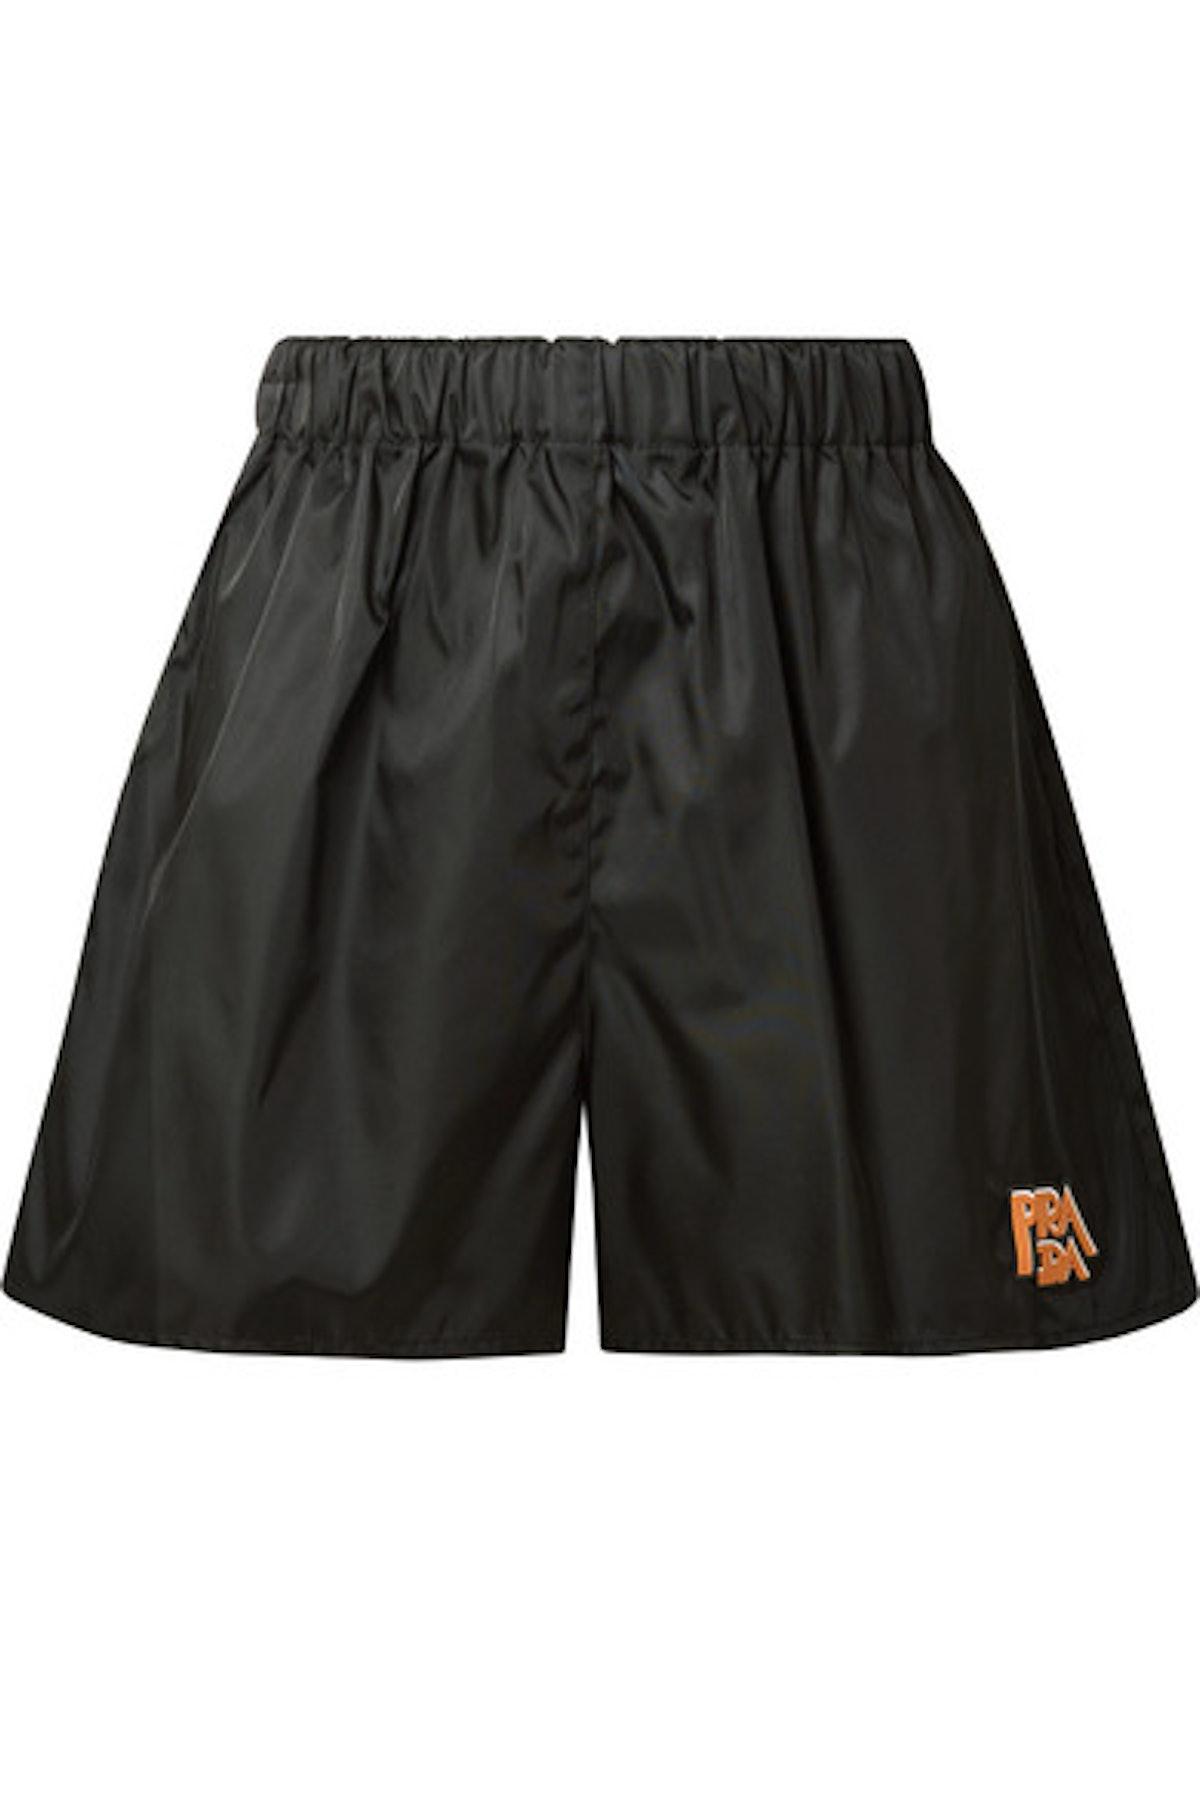 Appliqued Shell Shorts